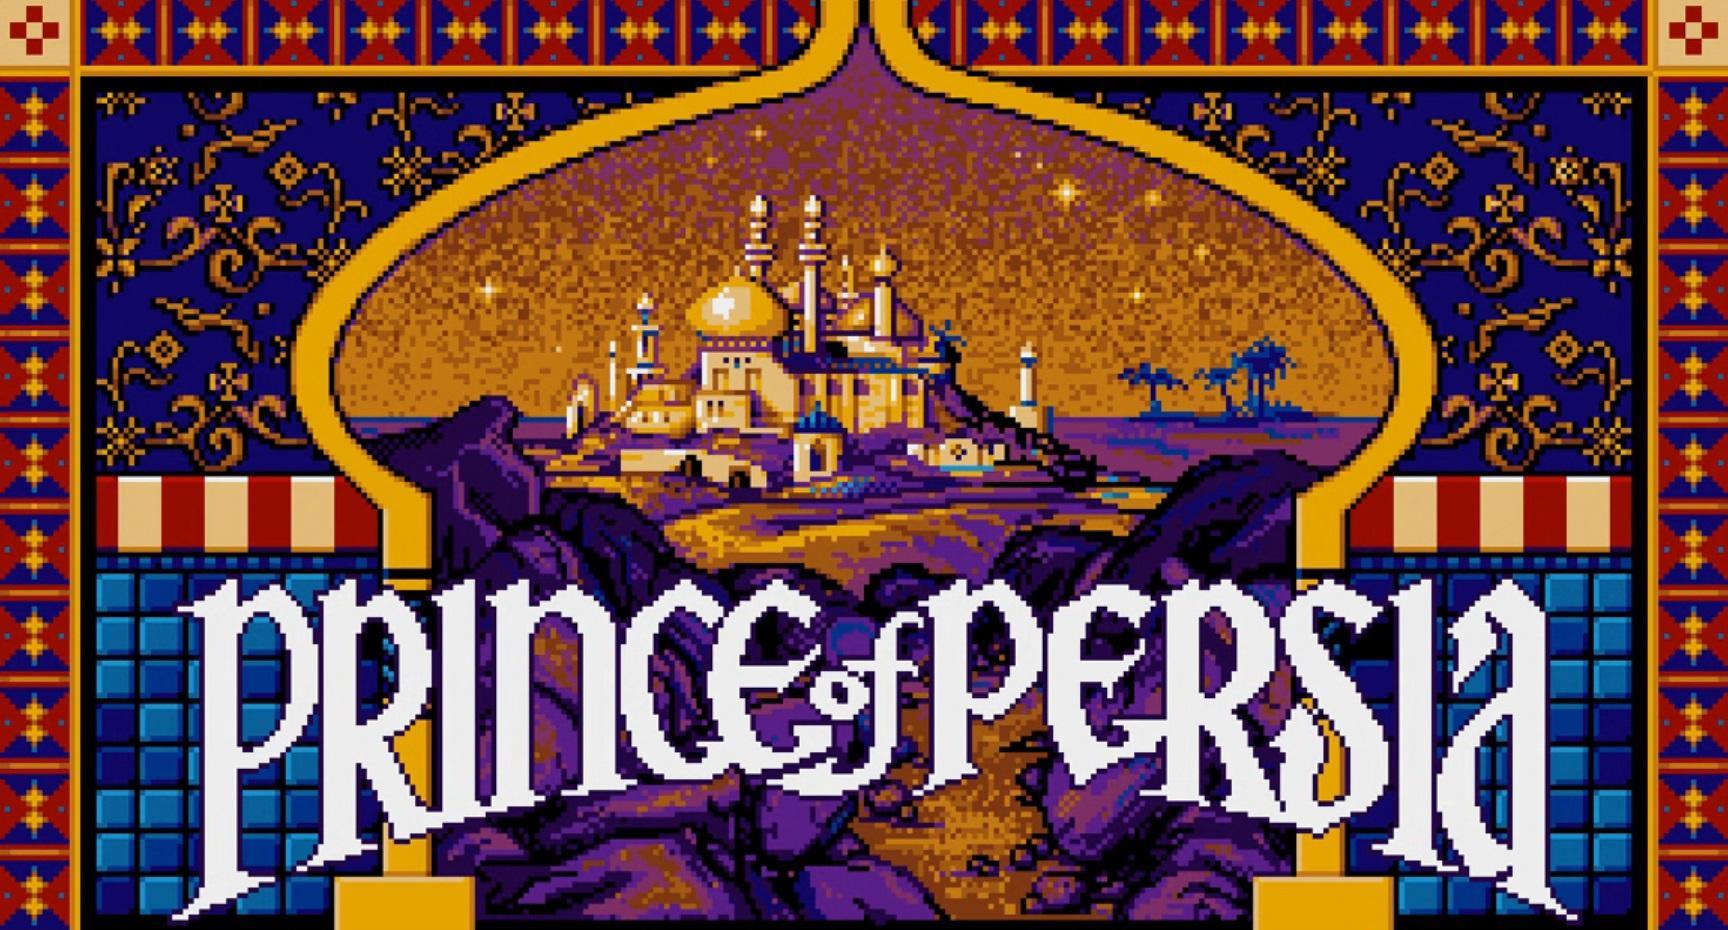 Prince of persia 1 tapeta